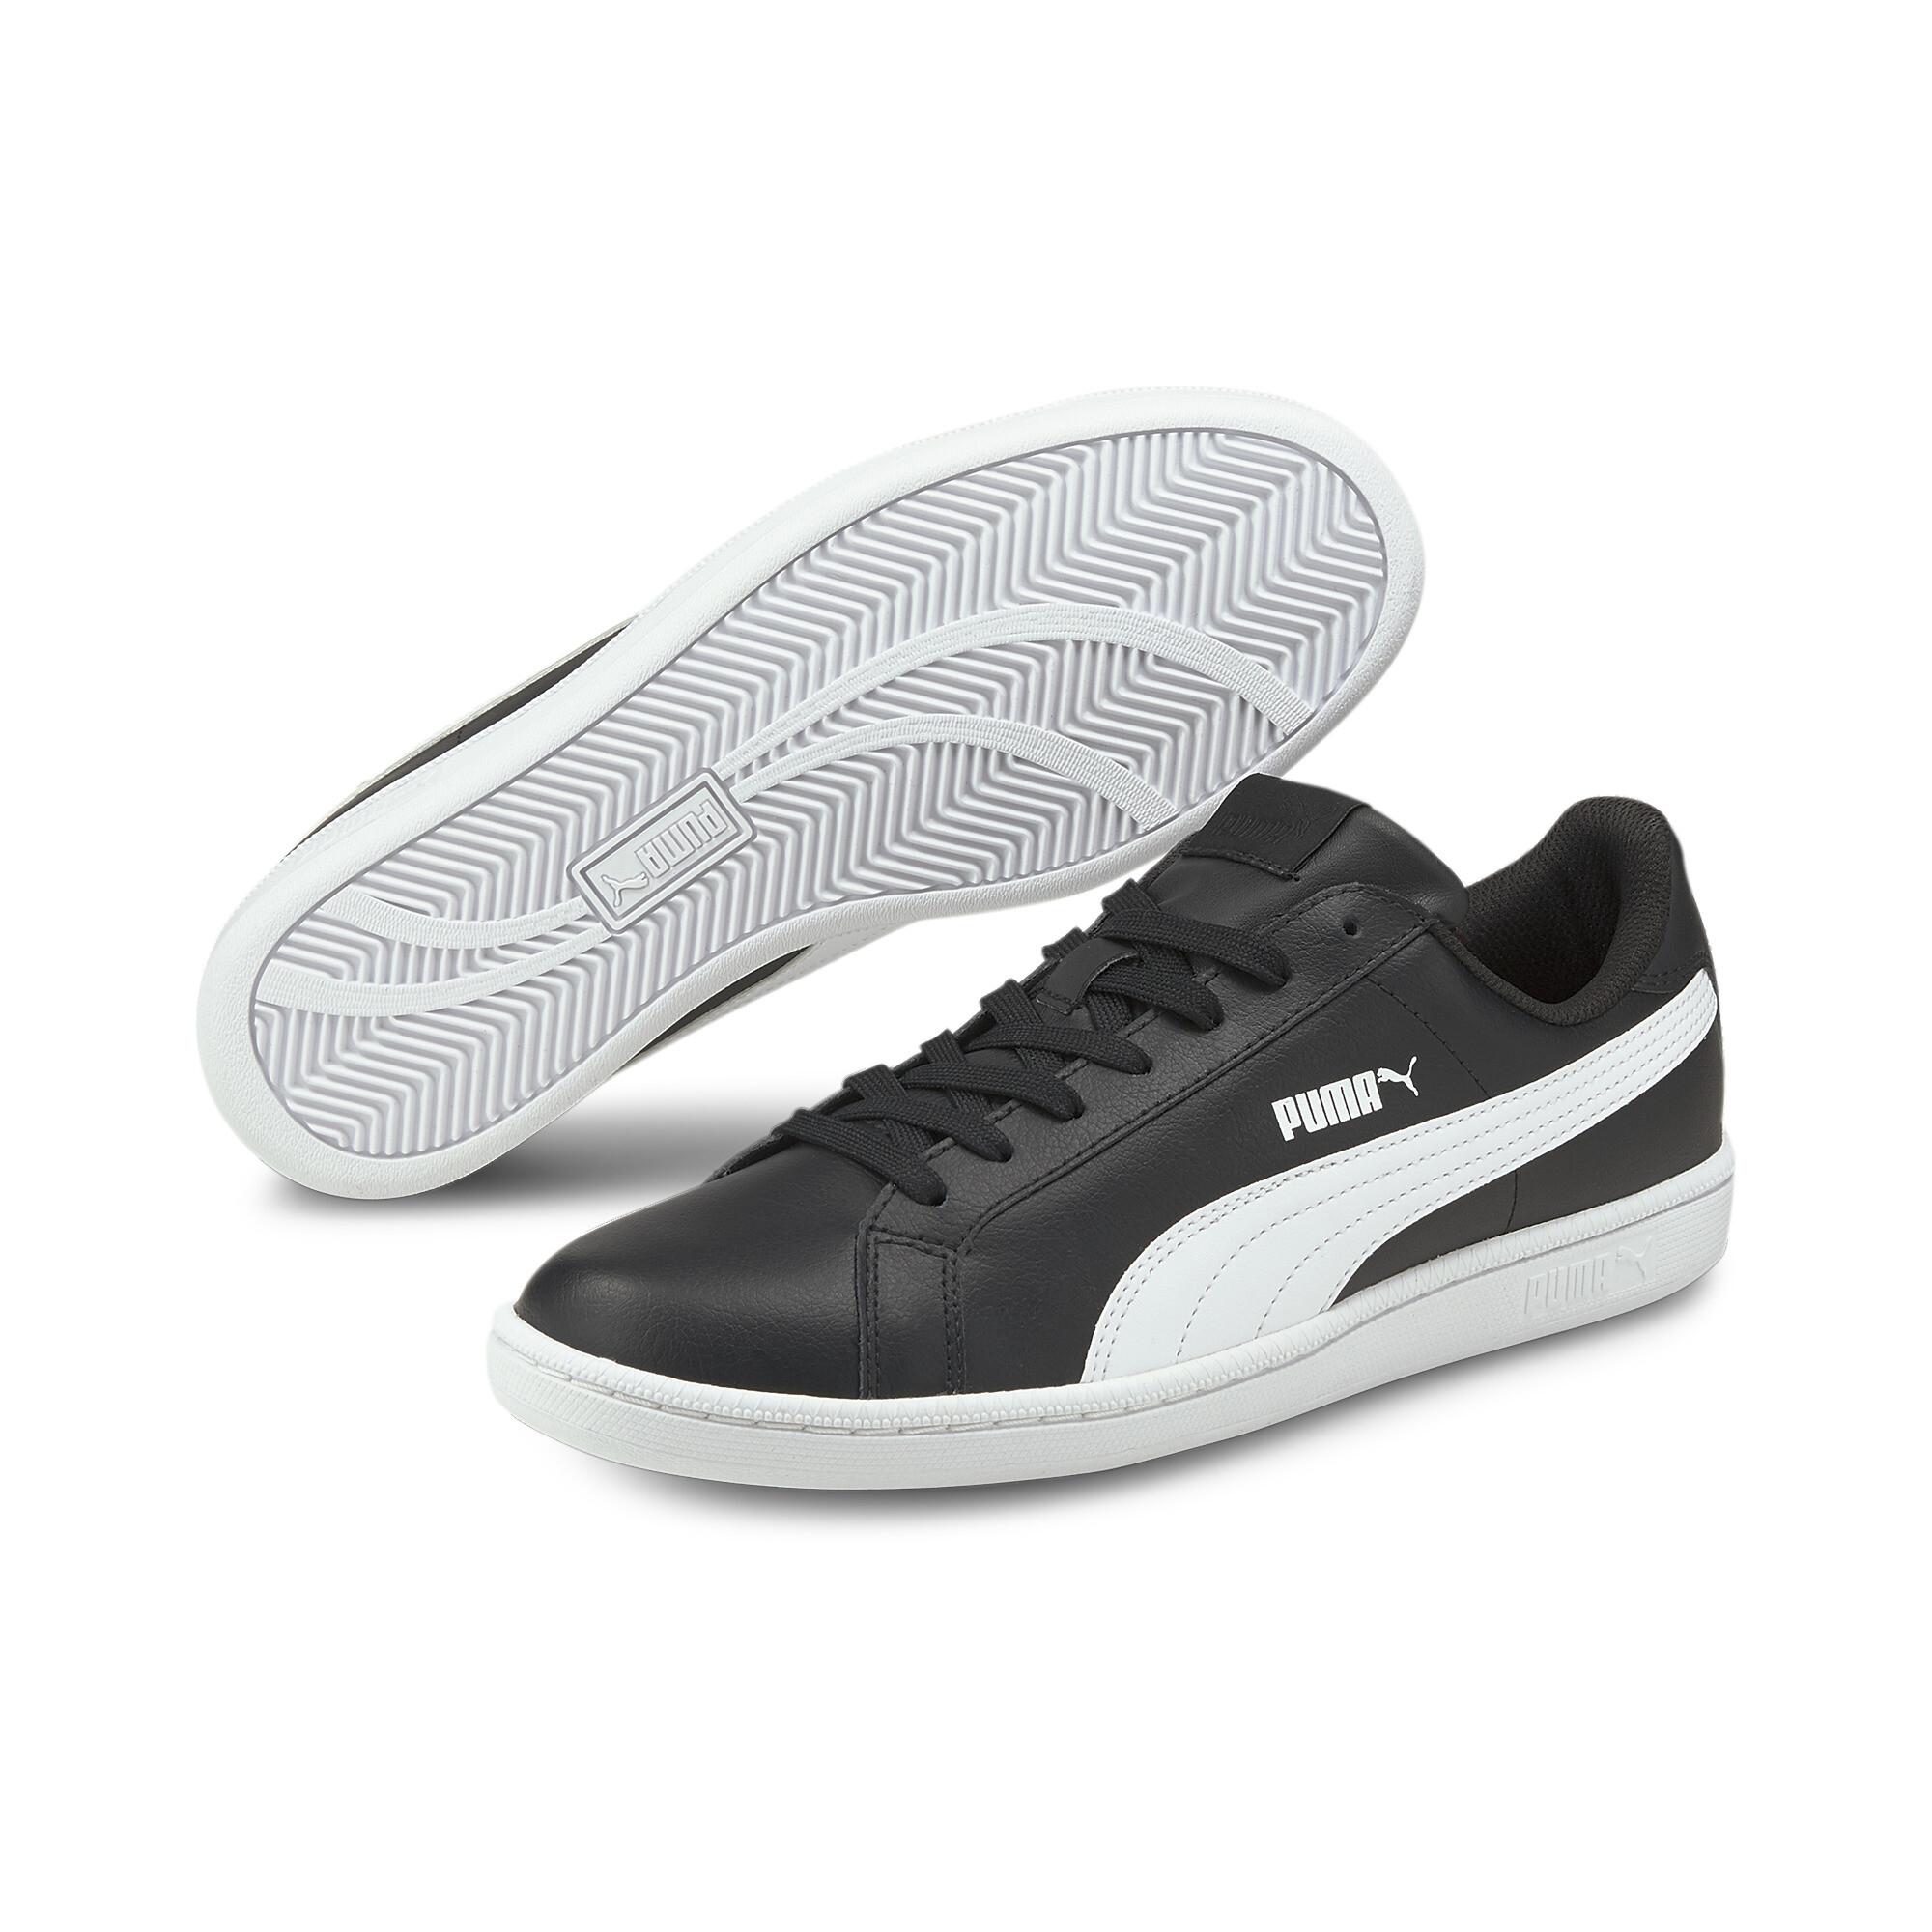 PUMA-Smash-Trainers-Schuhe-Sneakers-Sport-Classics-Unisex-Neu Indexbild 22